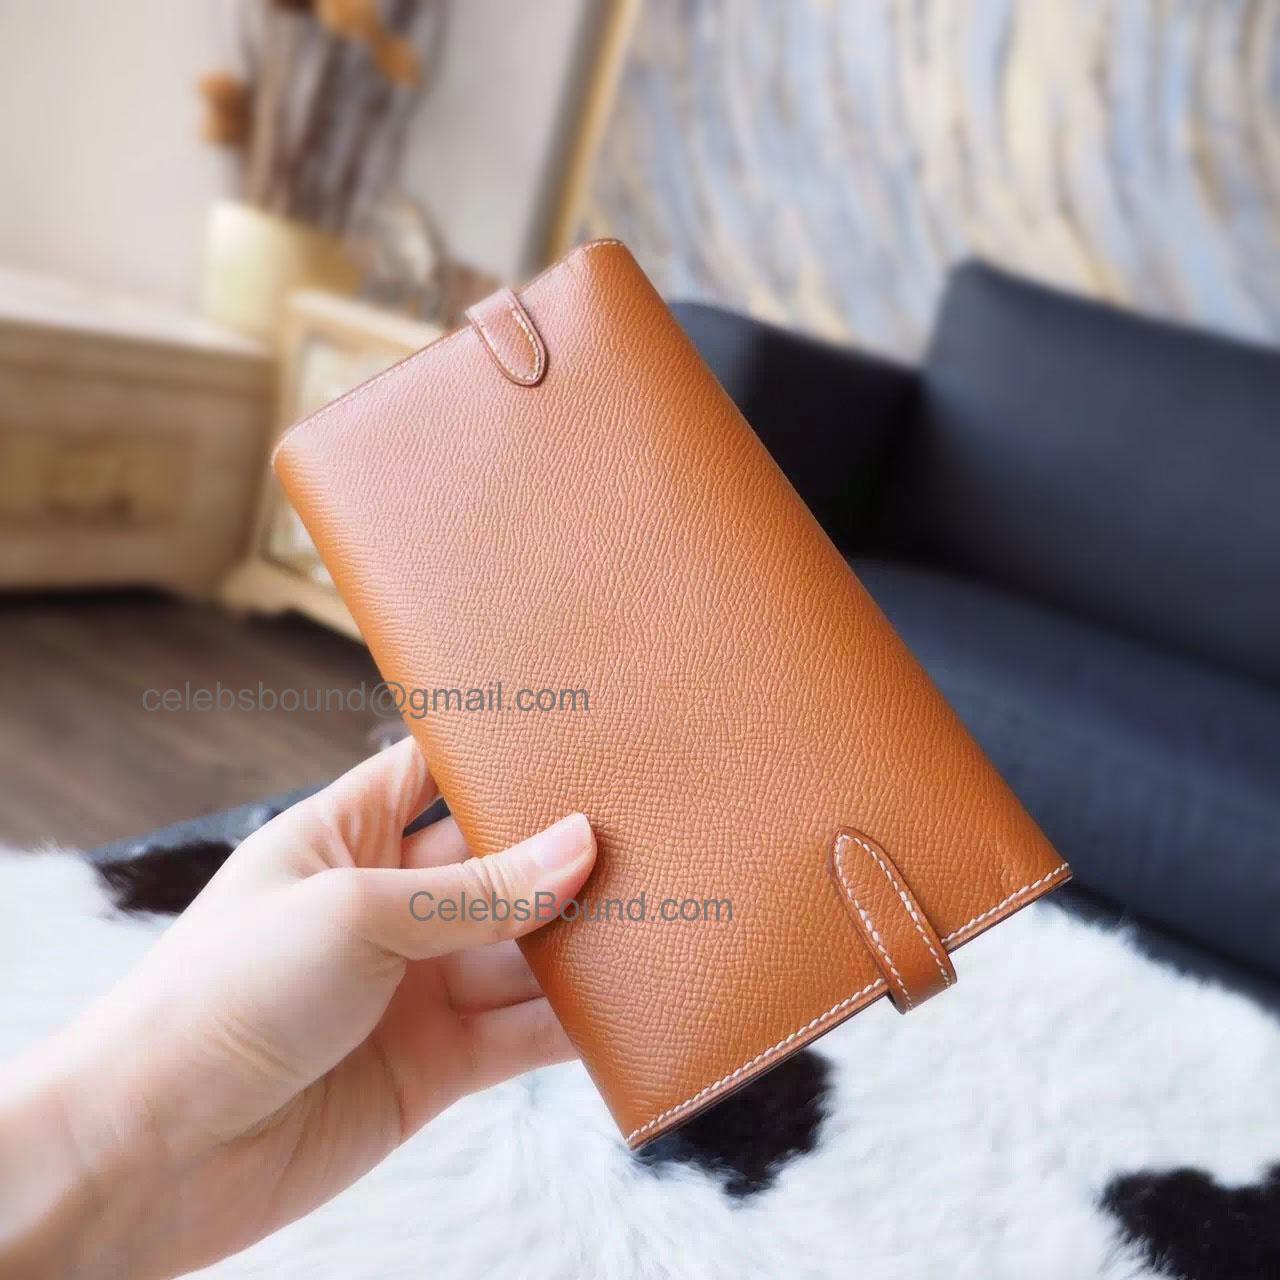 bd94a5ee3721 Hermes Kelly Long Wallet Handmade in ck37 Gold Epsom Calfskin GHW -